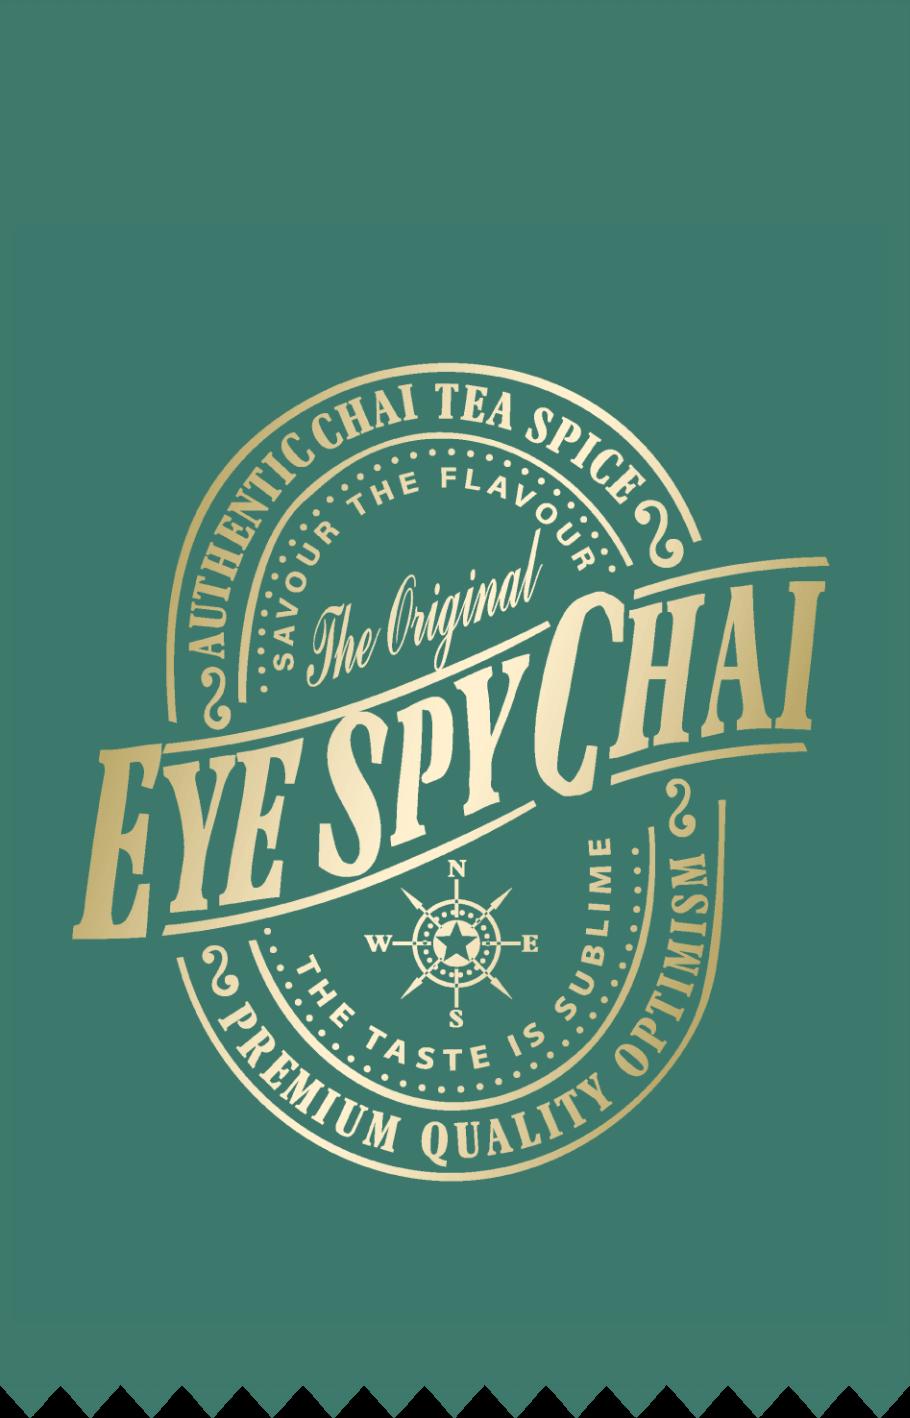 Eye Spai Coffee